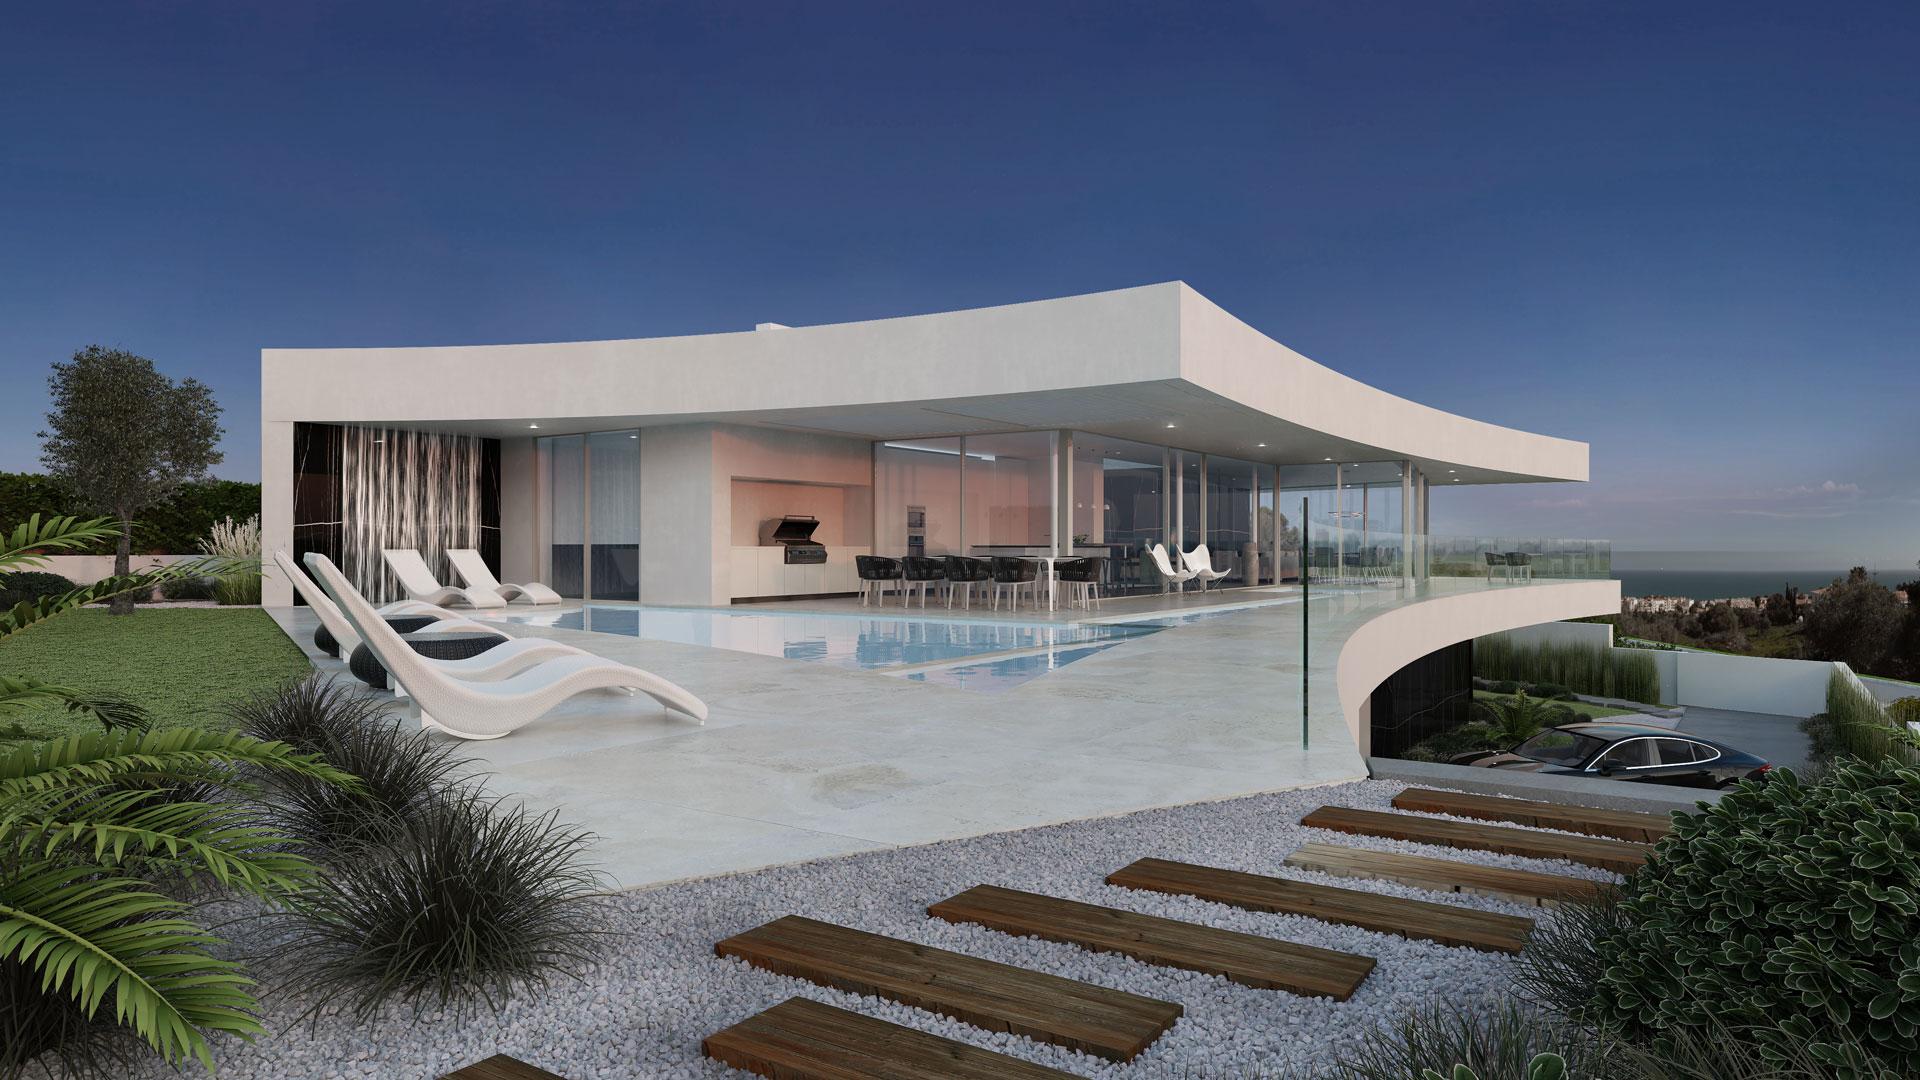 4 Bedroom Villa Praia da Luz, Western Algarve Ref: GV590F